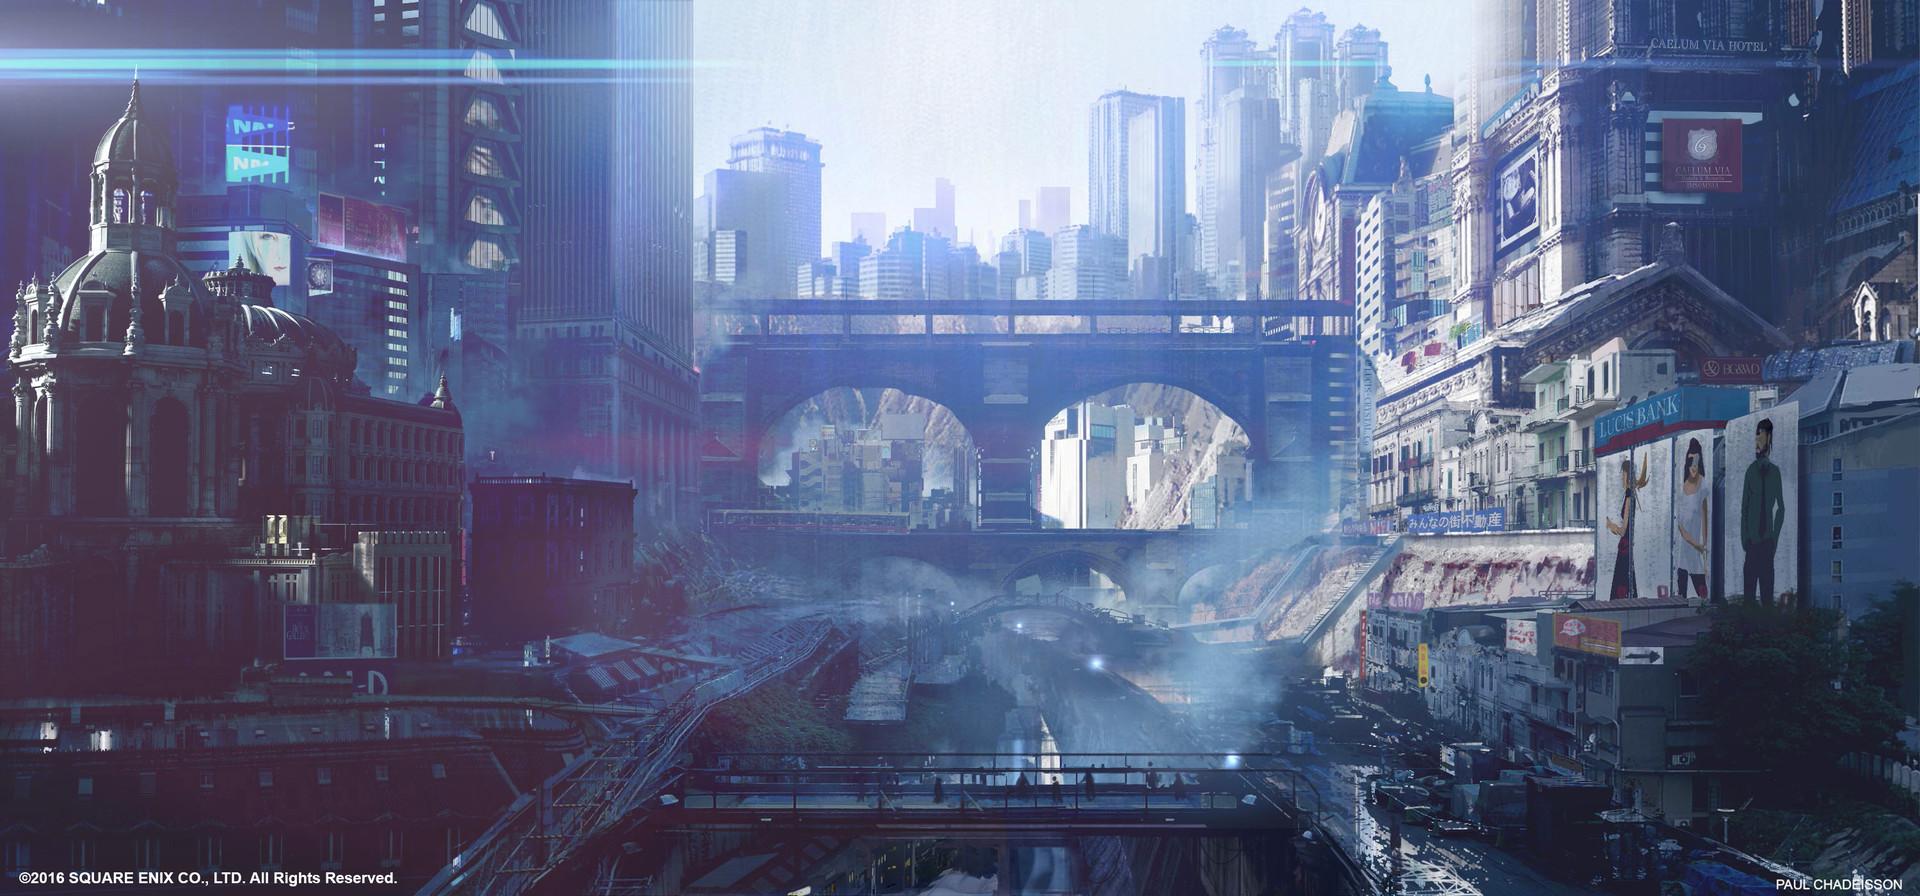 ArtStation Final Fantasy XV Kingsglaive Insomnia City View Paul Chadeisson